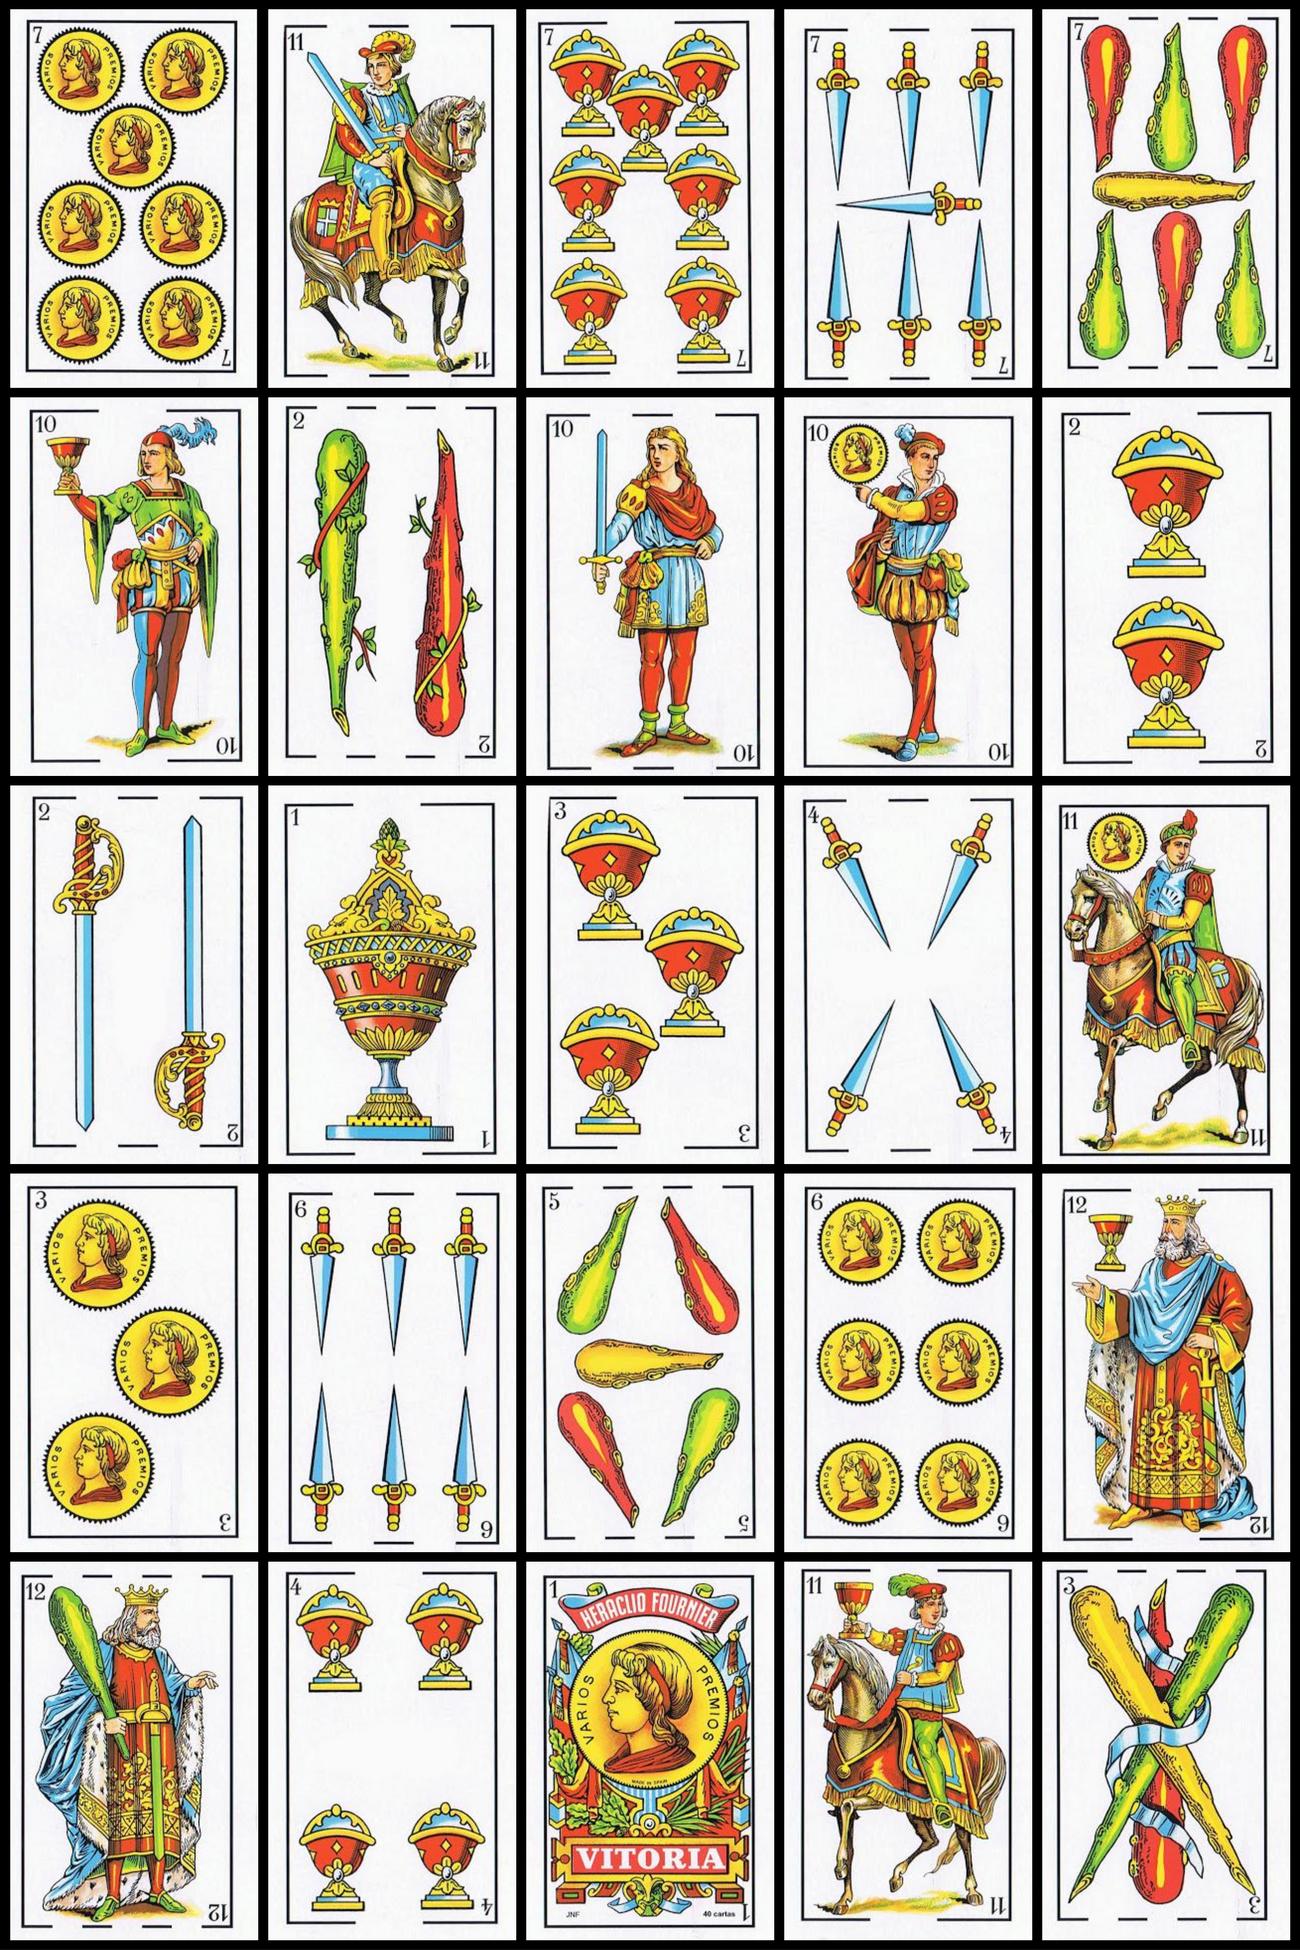 Cartones Del Poquino Baraja De Cartas Cartas Baraja Espanola Bingo Para Imprimir